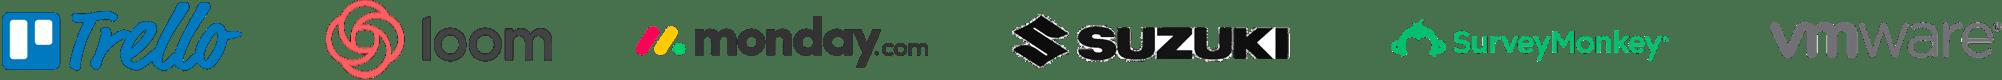 Trello, Loom, Monday.com, Suzuki, Survey Monkey, and VMWare logos